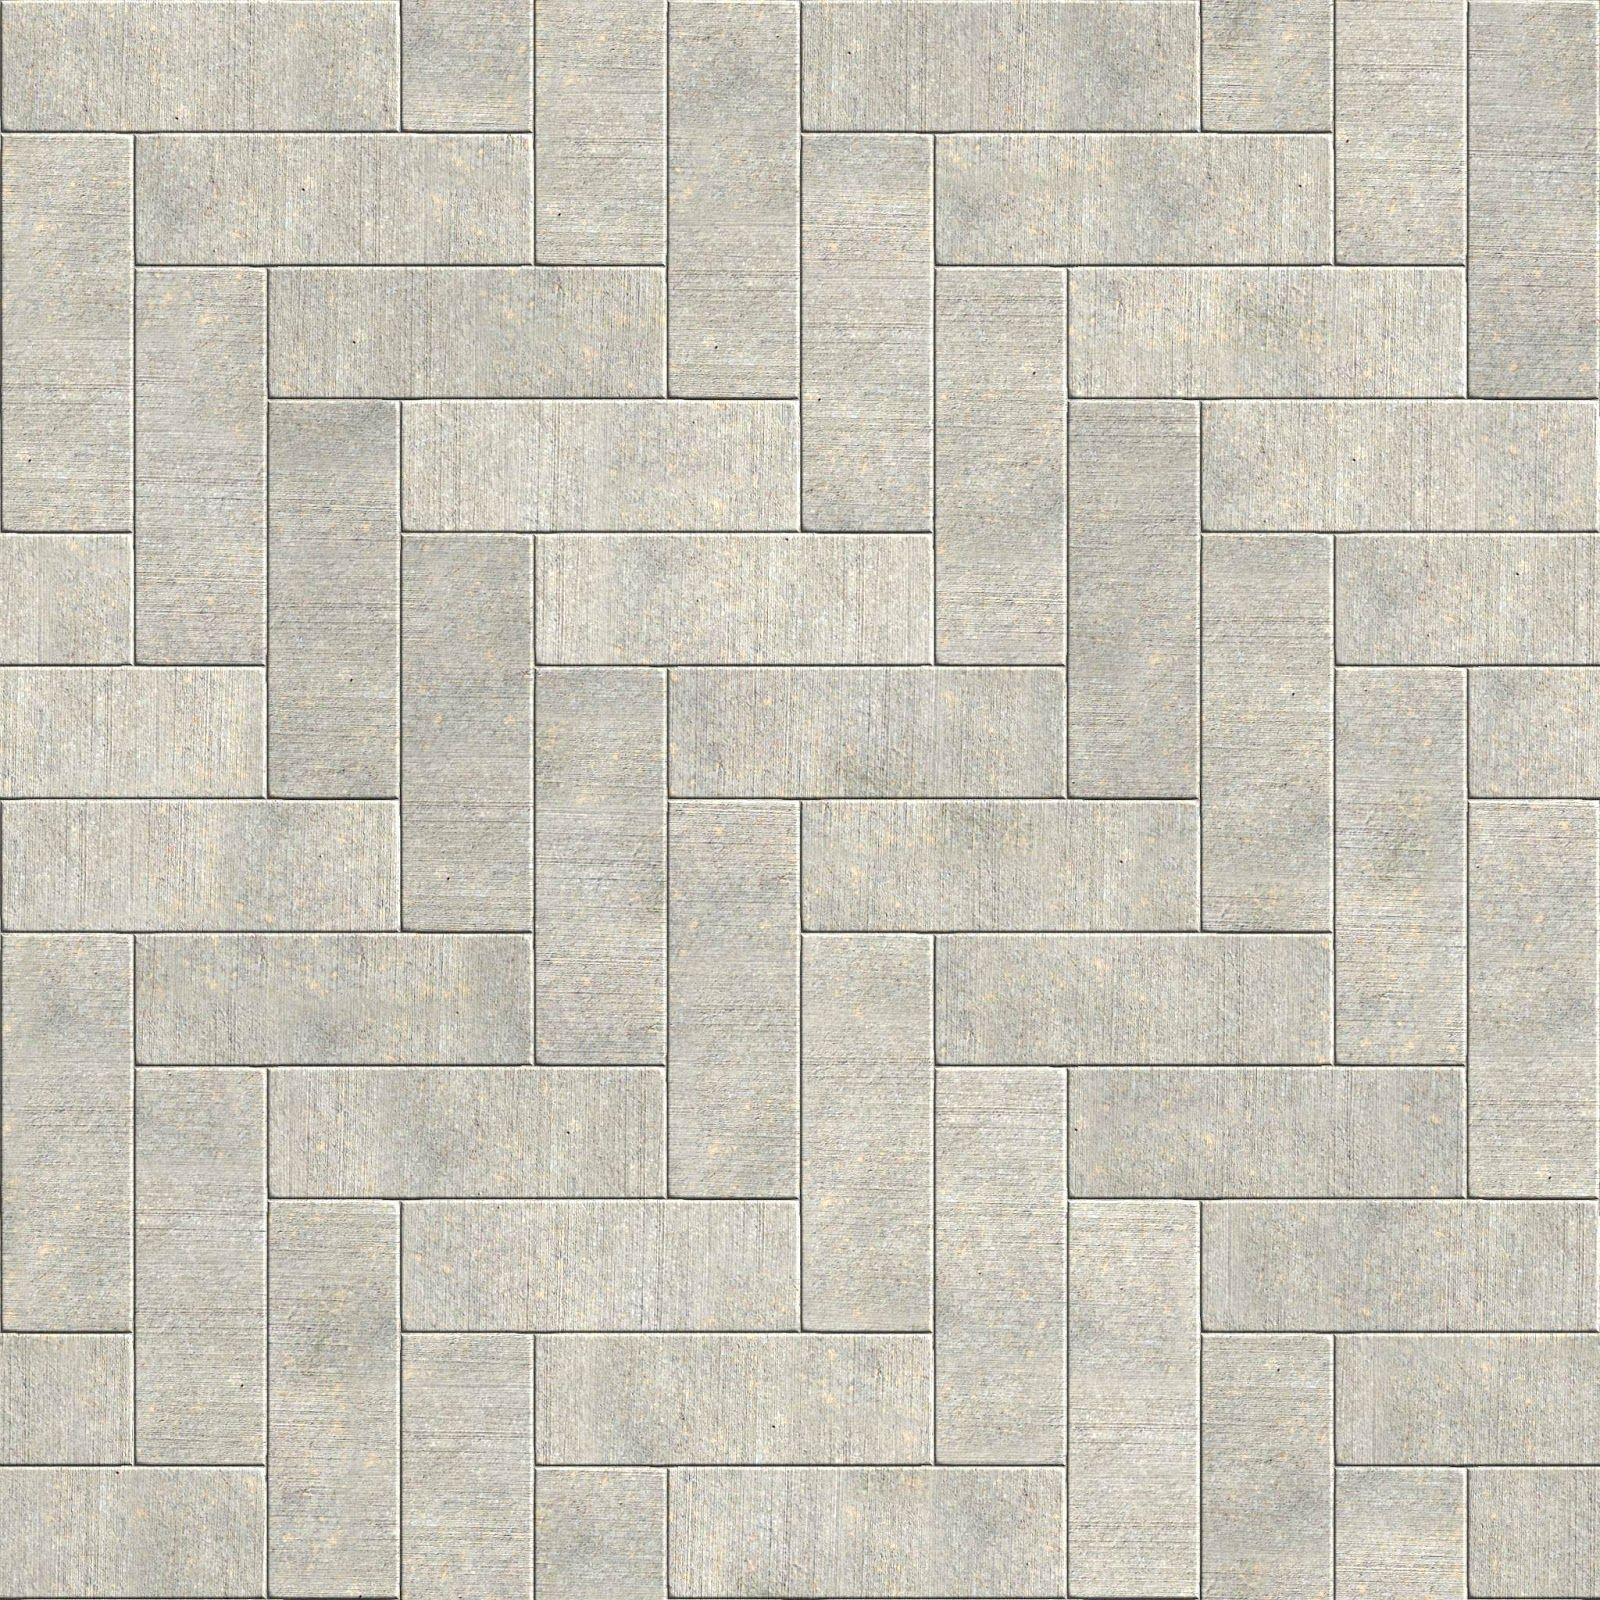 Seamless concrete tiles maps texturise textures pinterest concrete tiles concrete - Textuur tiling wit ...